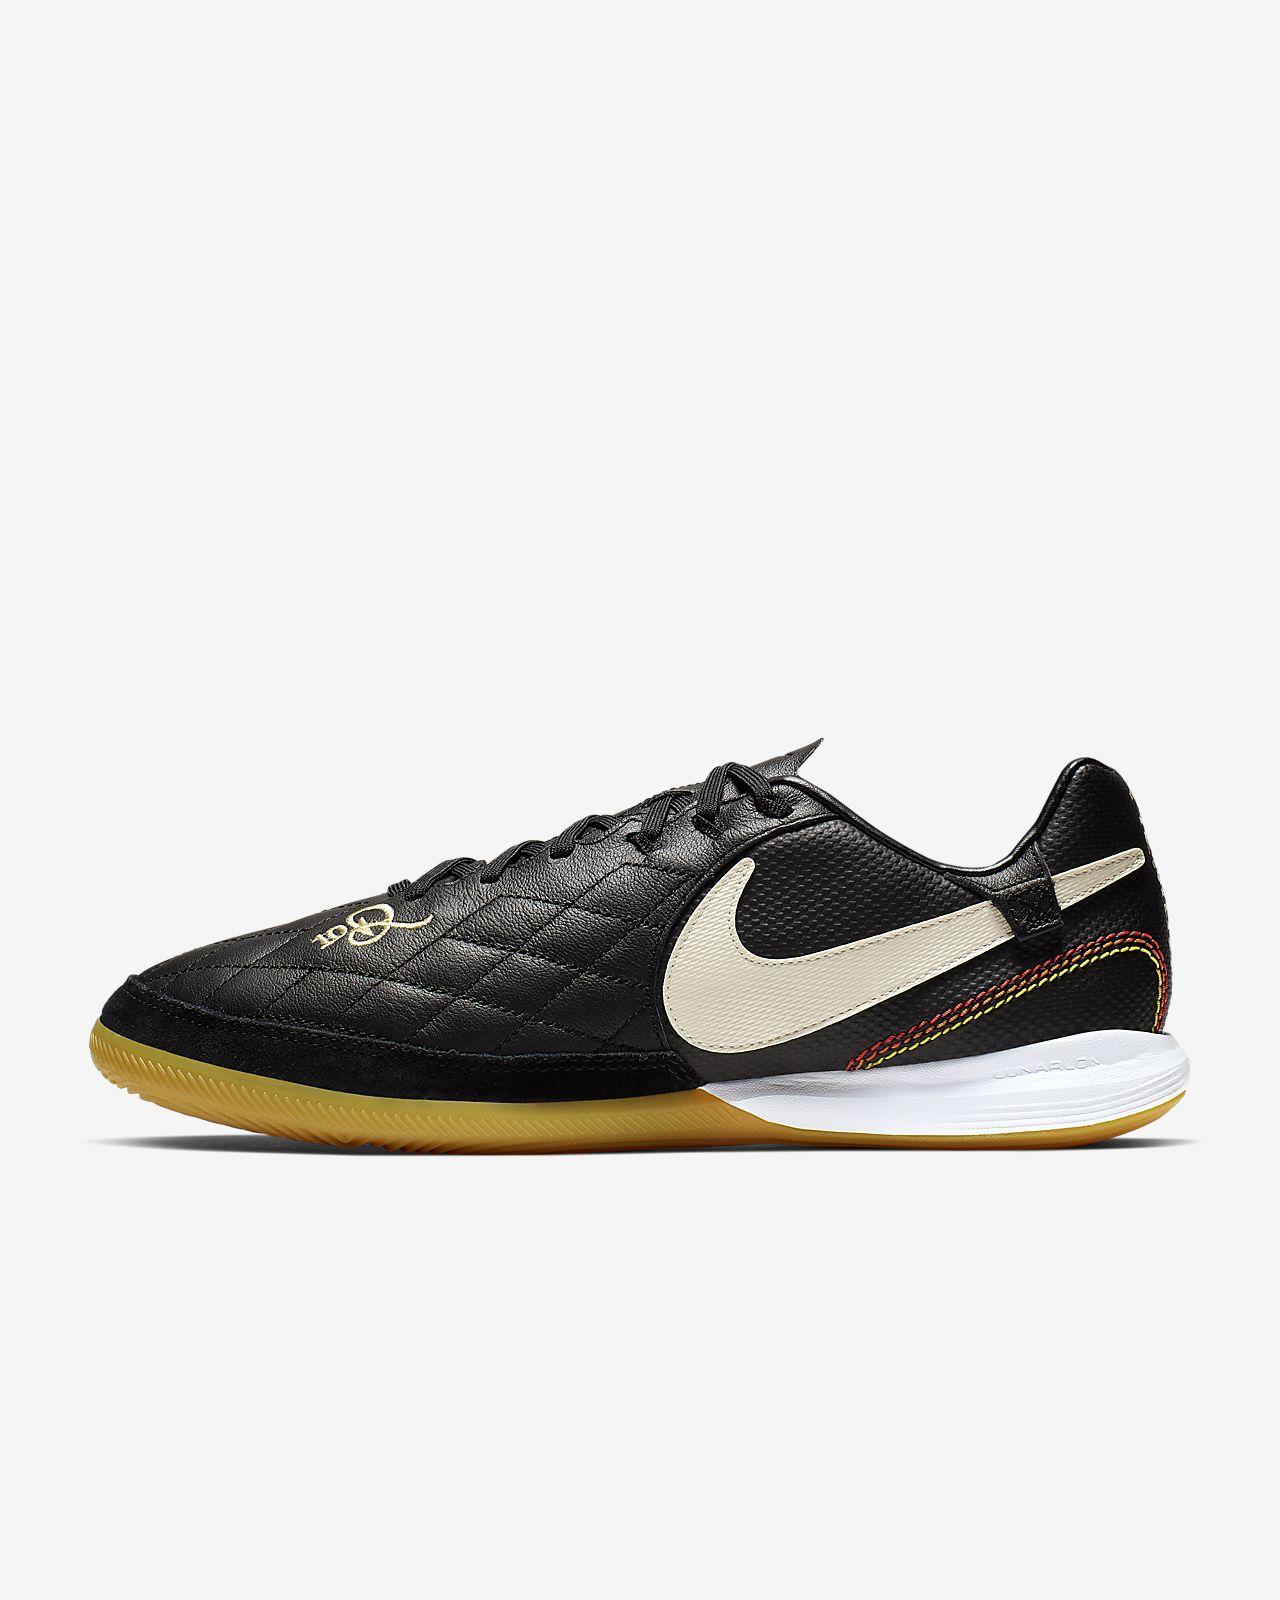 Nike Lunar Legend 7 Pro 10R IC 男/女室内/球场足球鞋